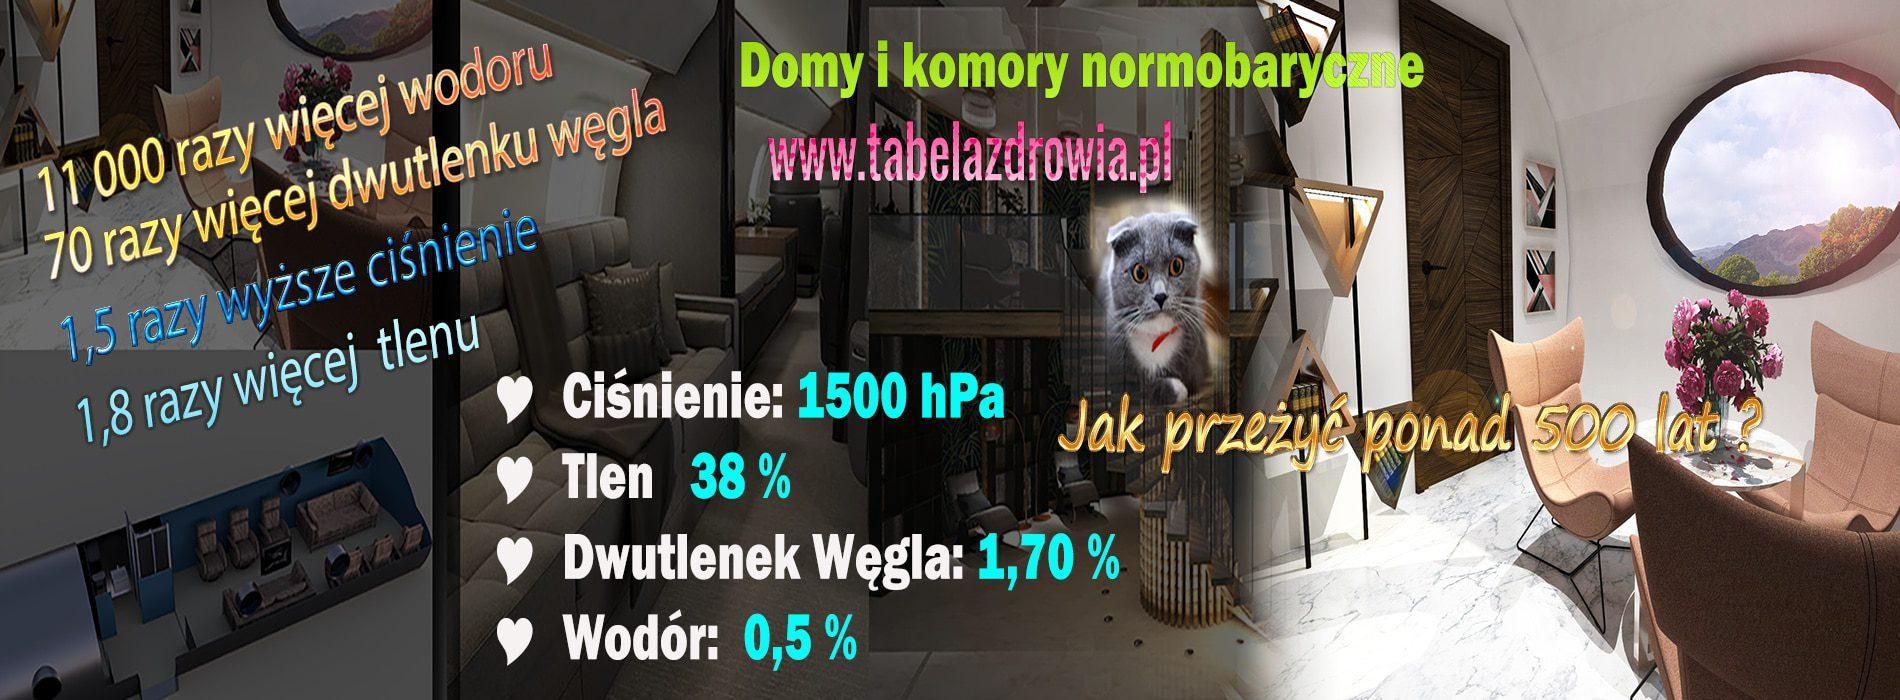 komory normobaryczne